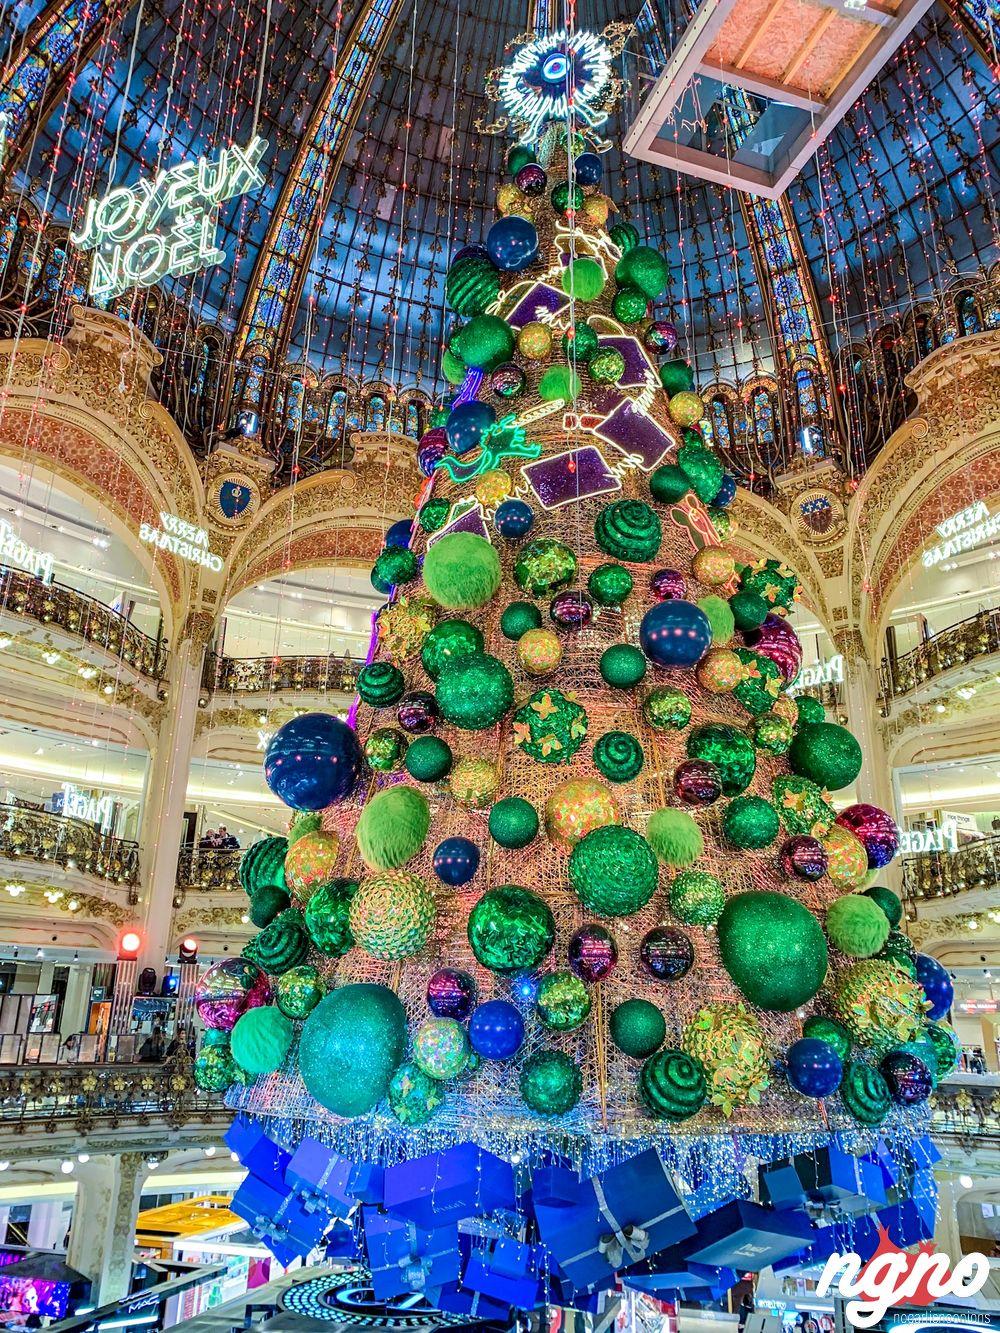 christmas-tree-lafayette-nogarlicnoonions-112018-12-24-09-37-31